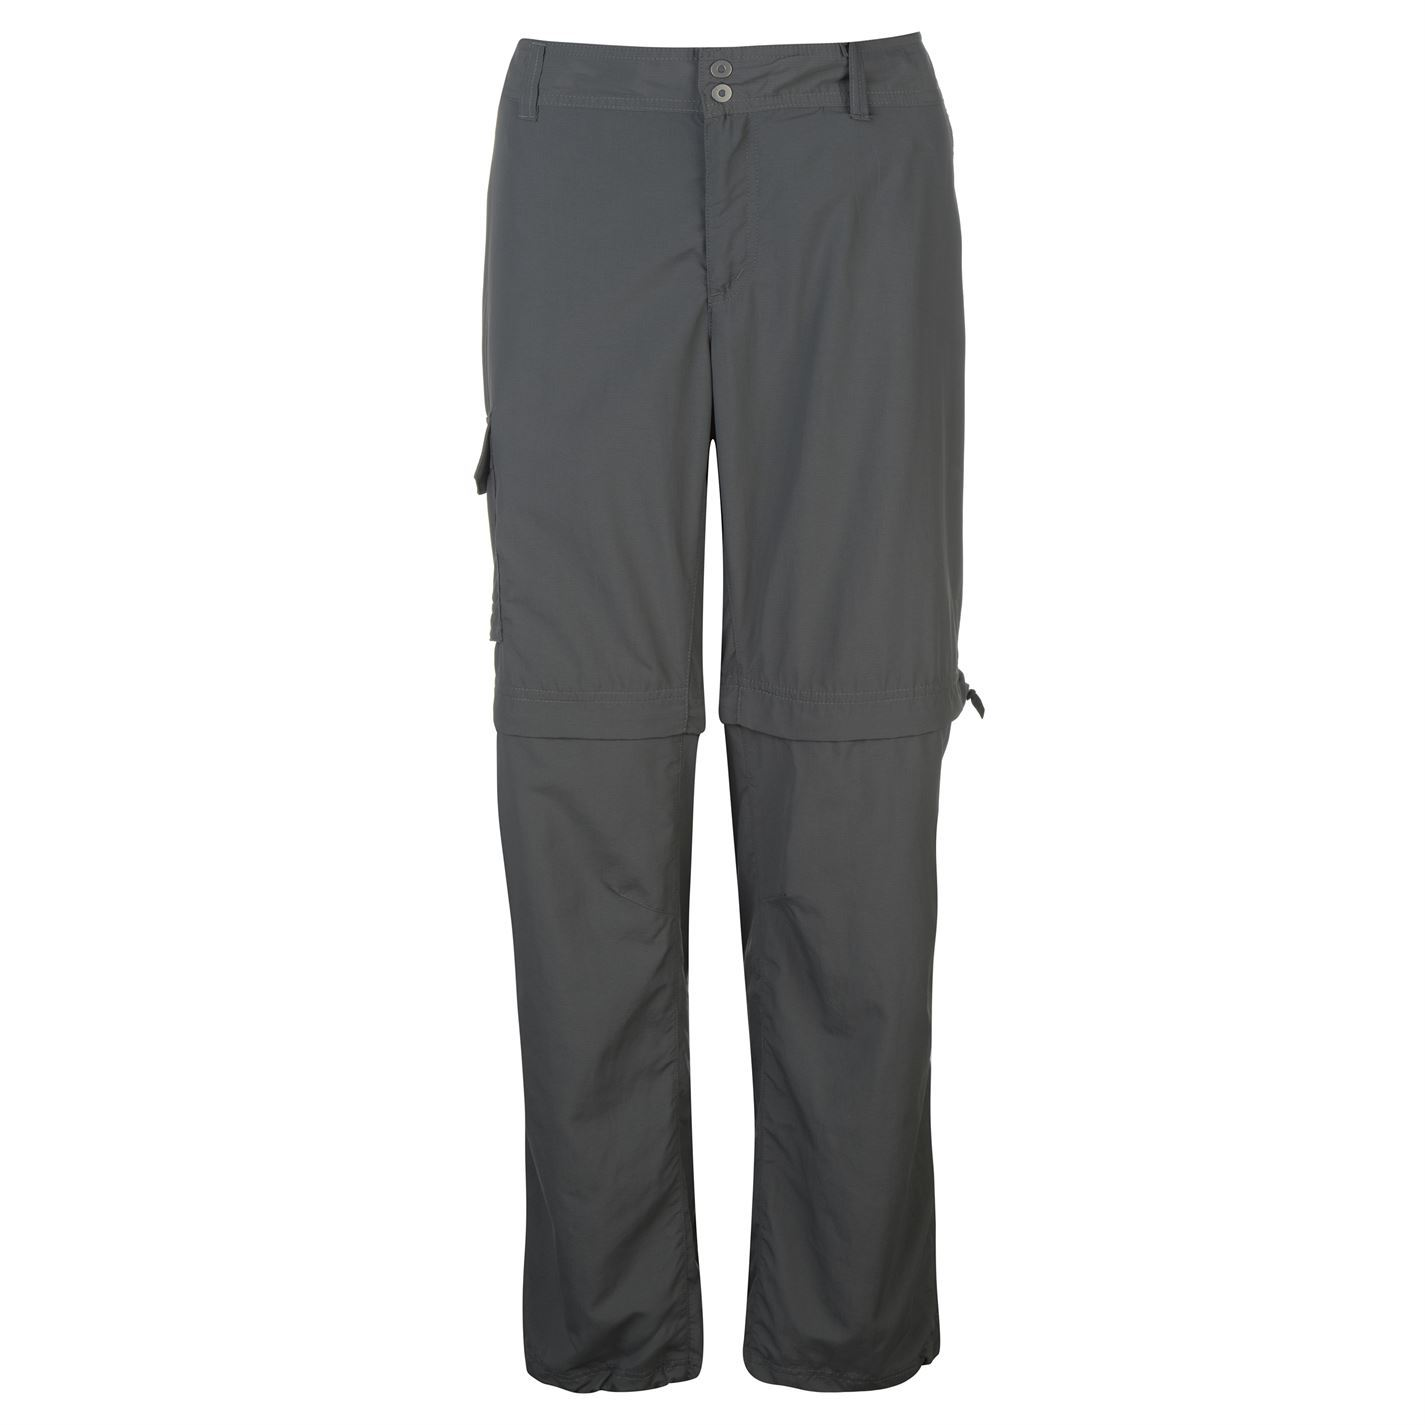 Columbia Womens Silver Ridge Zip Convertible Pants Walking Trousers Bottoms